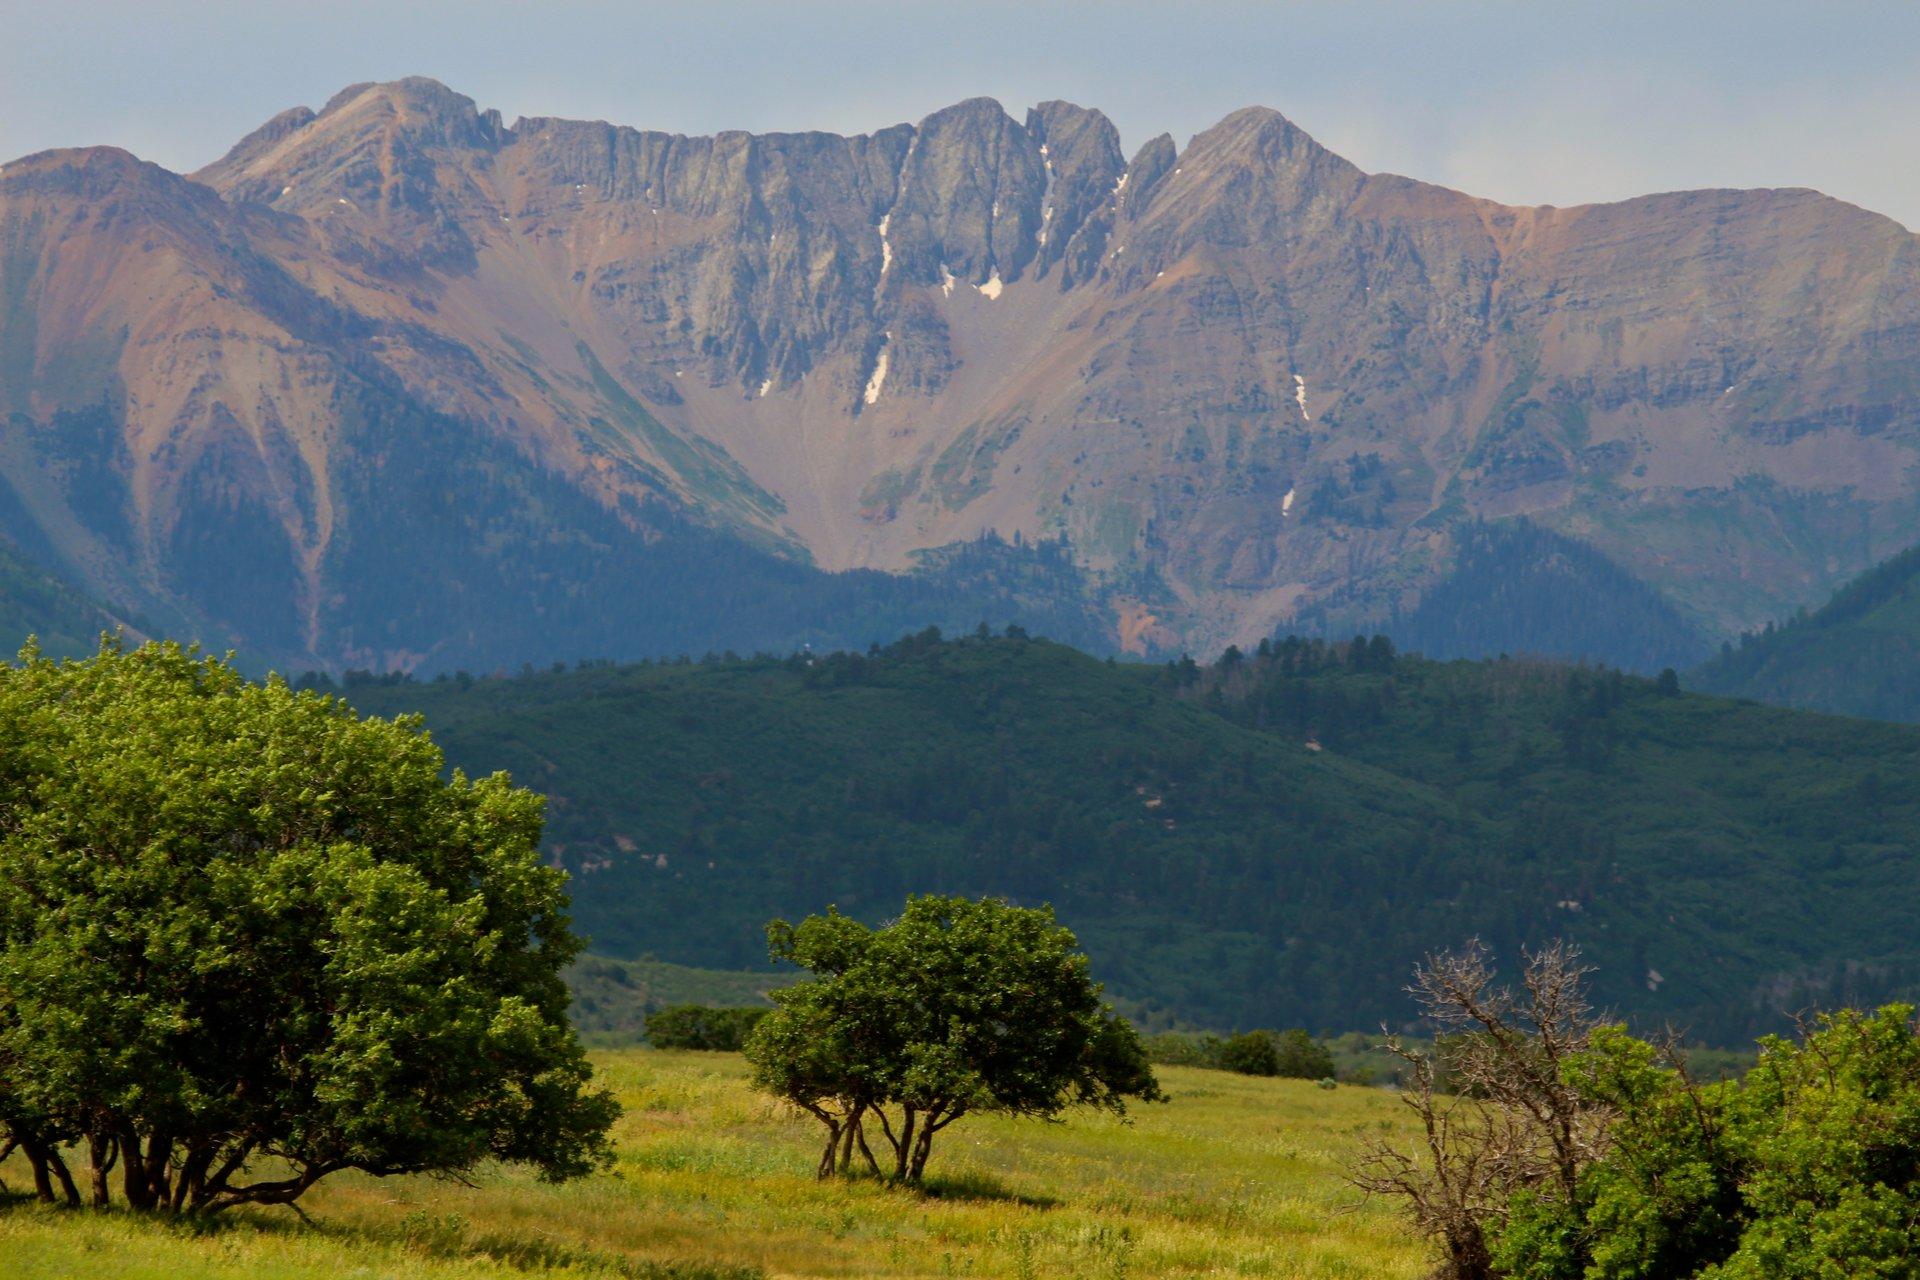 La Plata Peak in Colorado - Best Season 2020